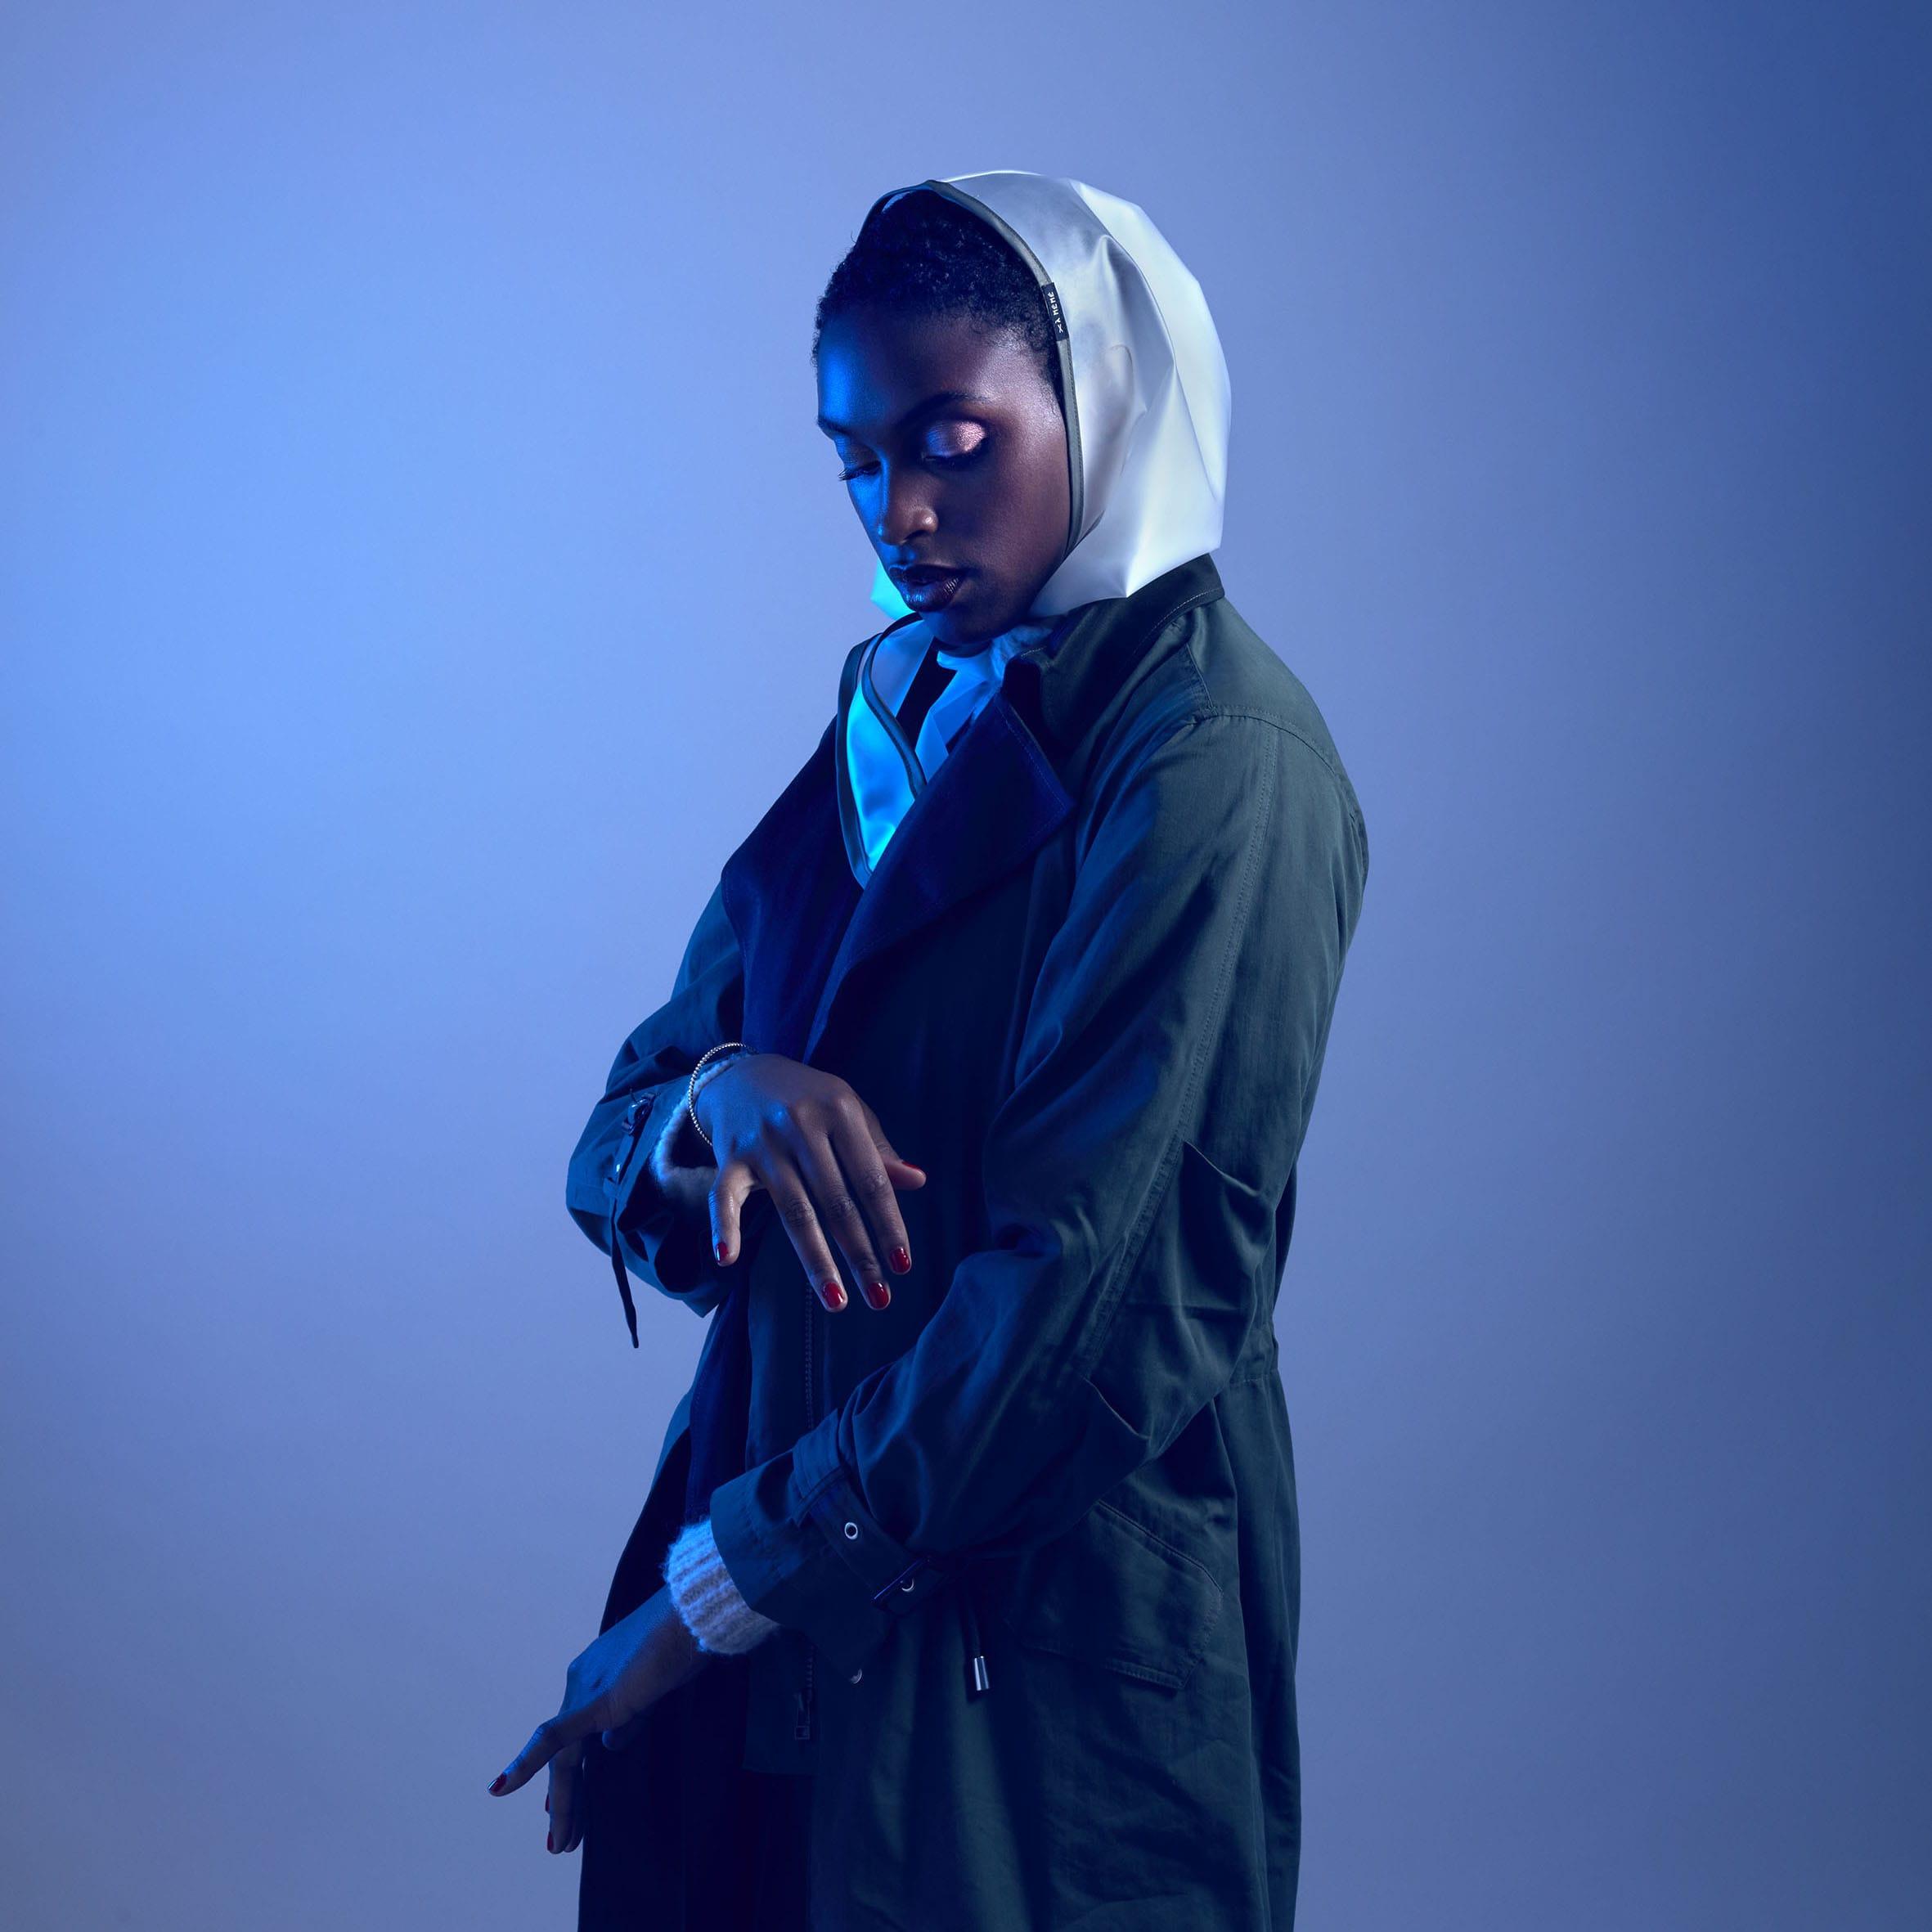 Capuche Paris - Transparent Khaki Rain Hood